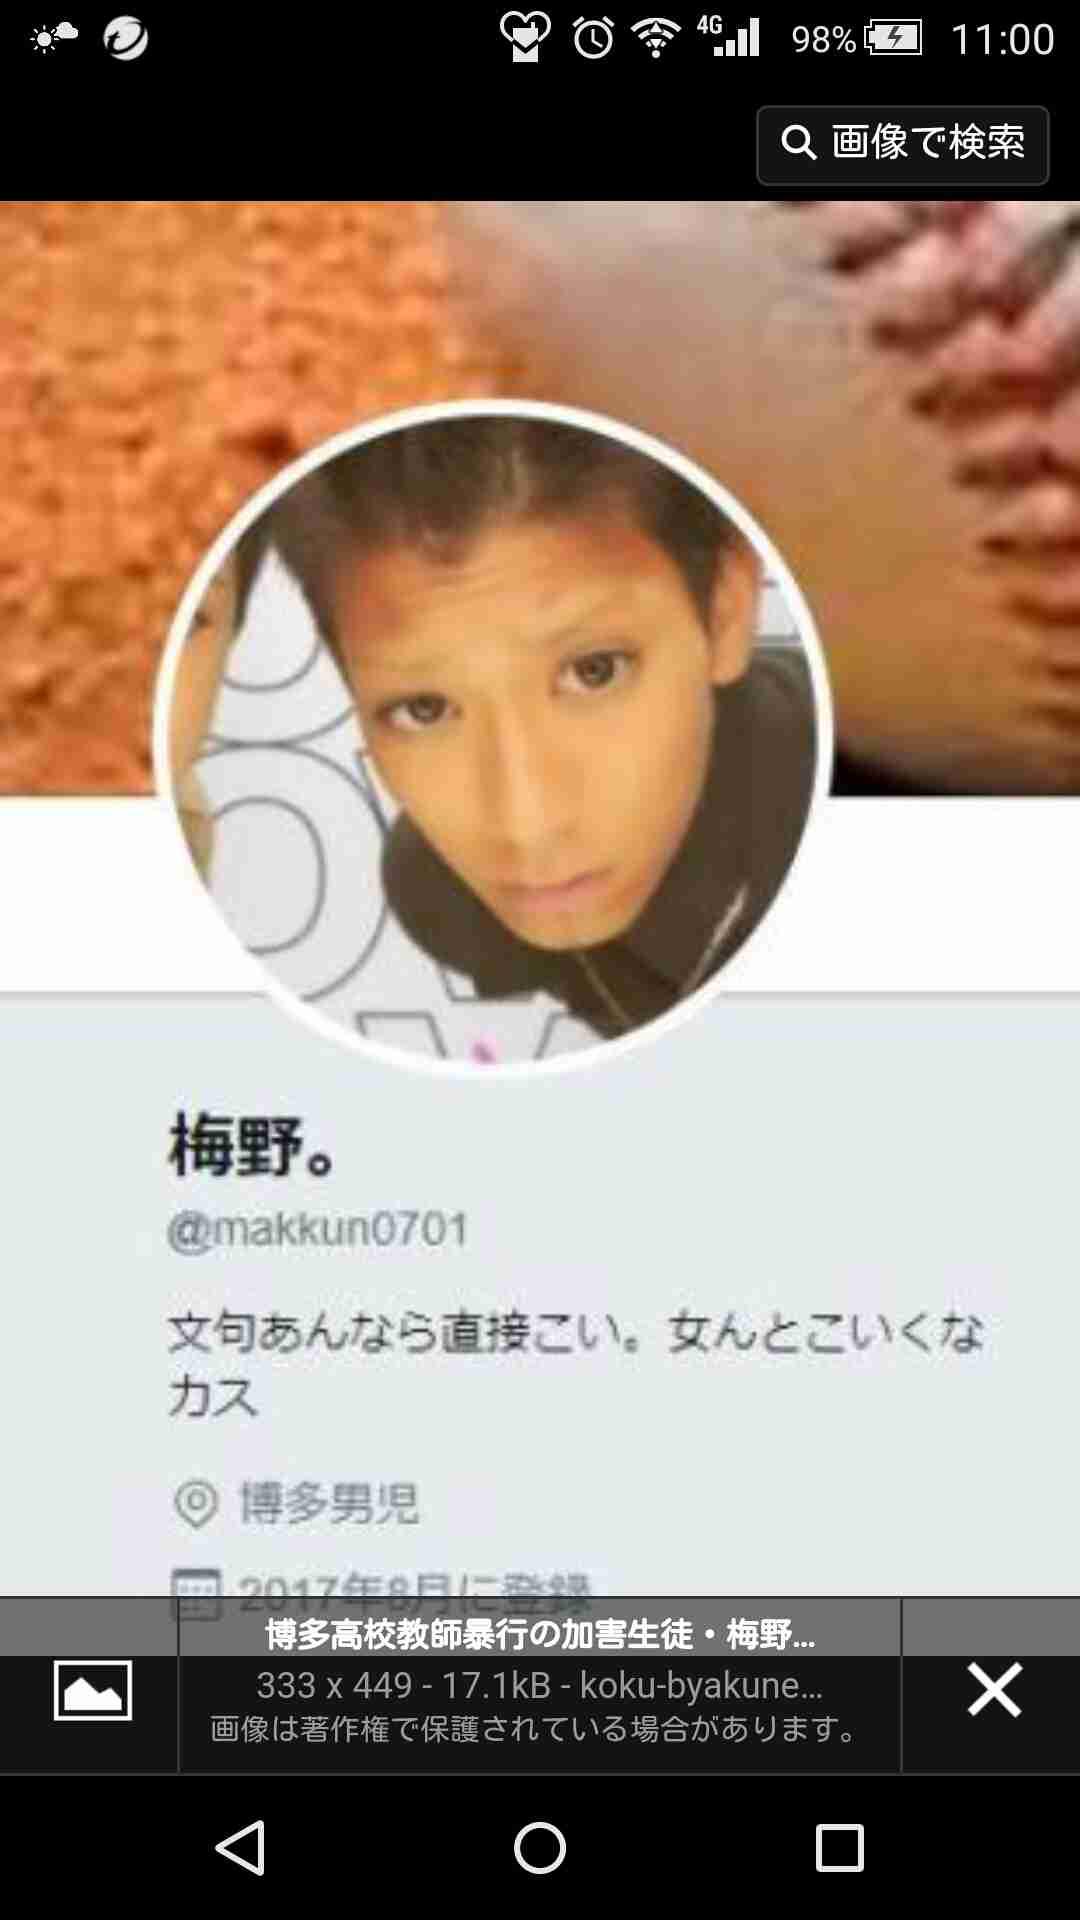 暴行動画  福岡の男子生徒を逮捕 講師への傷害容疑